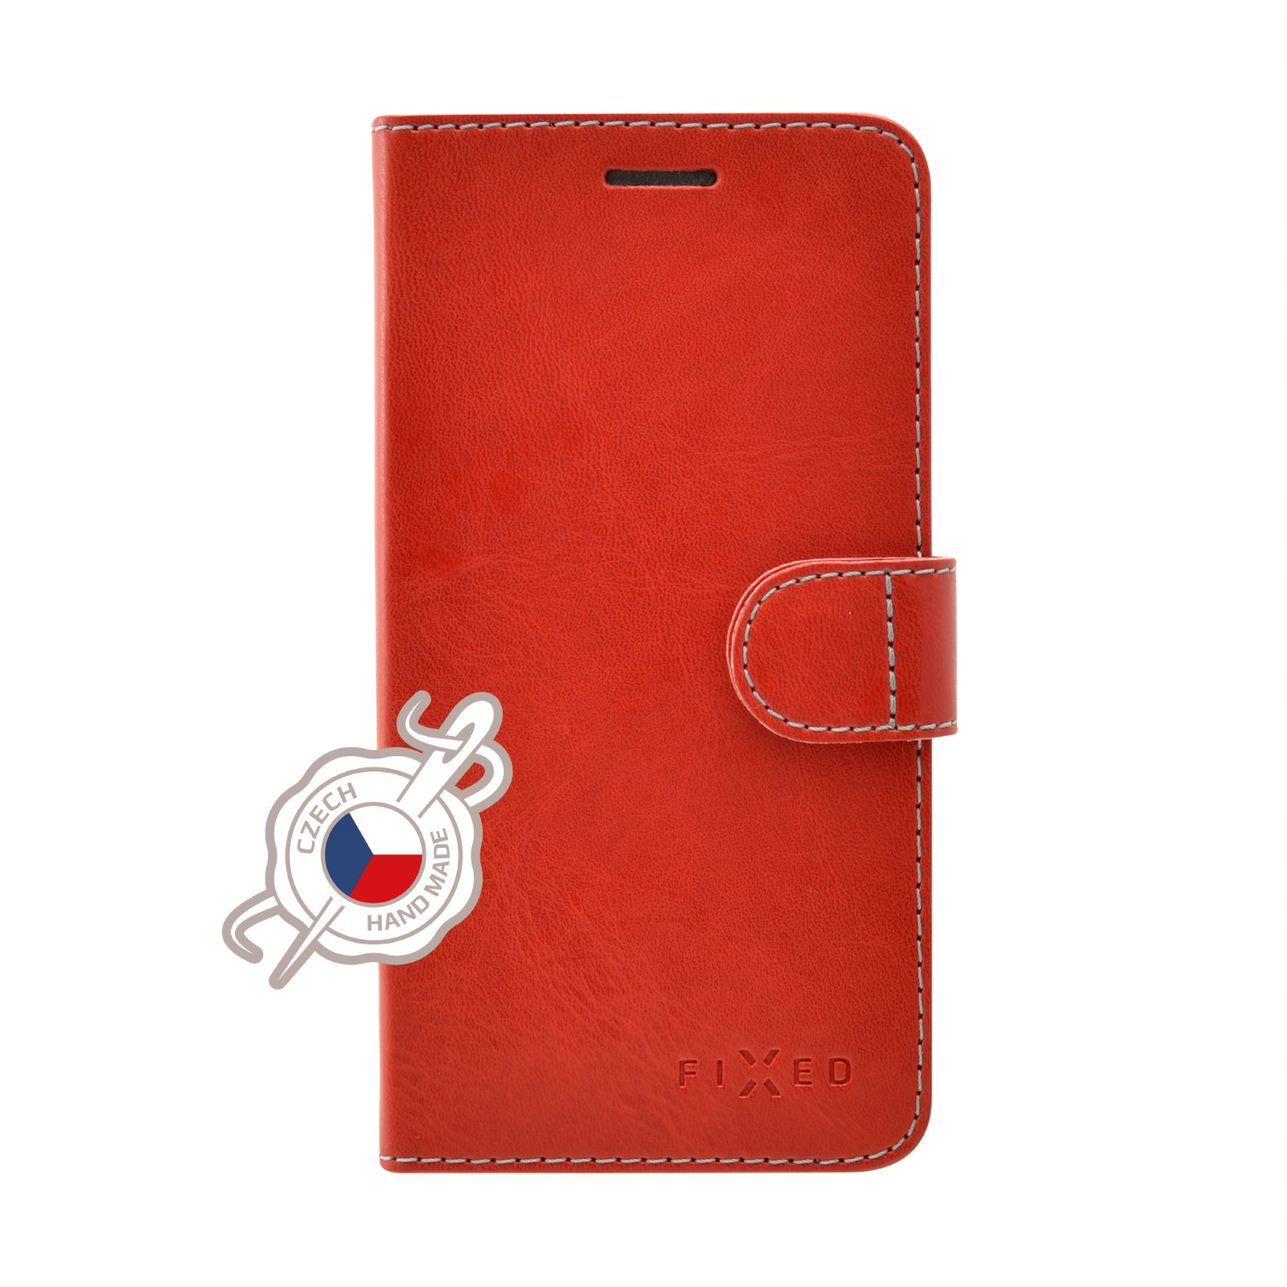 Pouzdro typu kniha FIXED FIT pro Samsung Galaxy Xcover 4/4S, červené